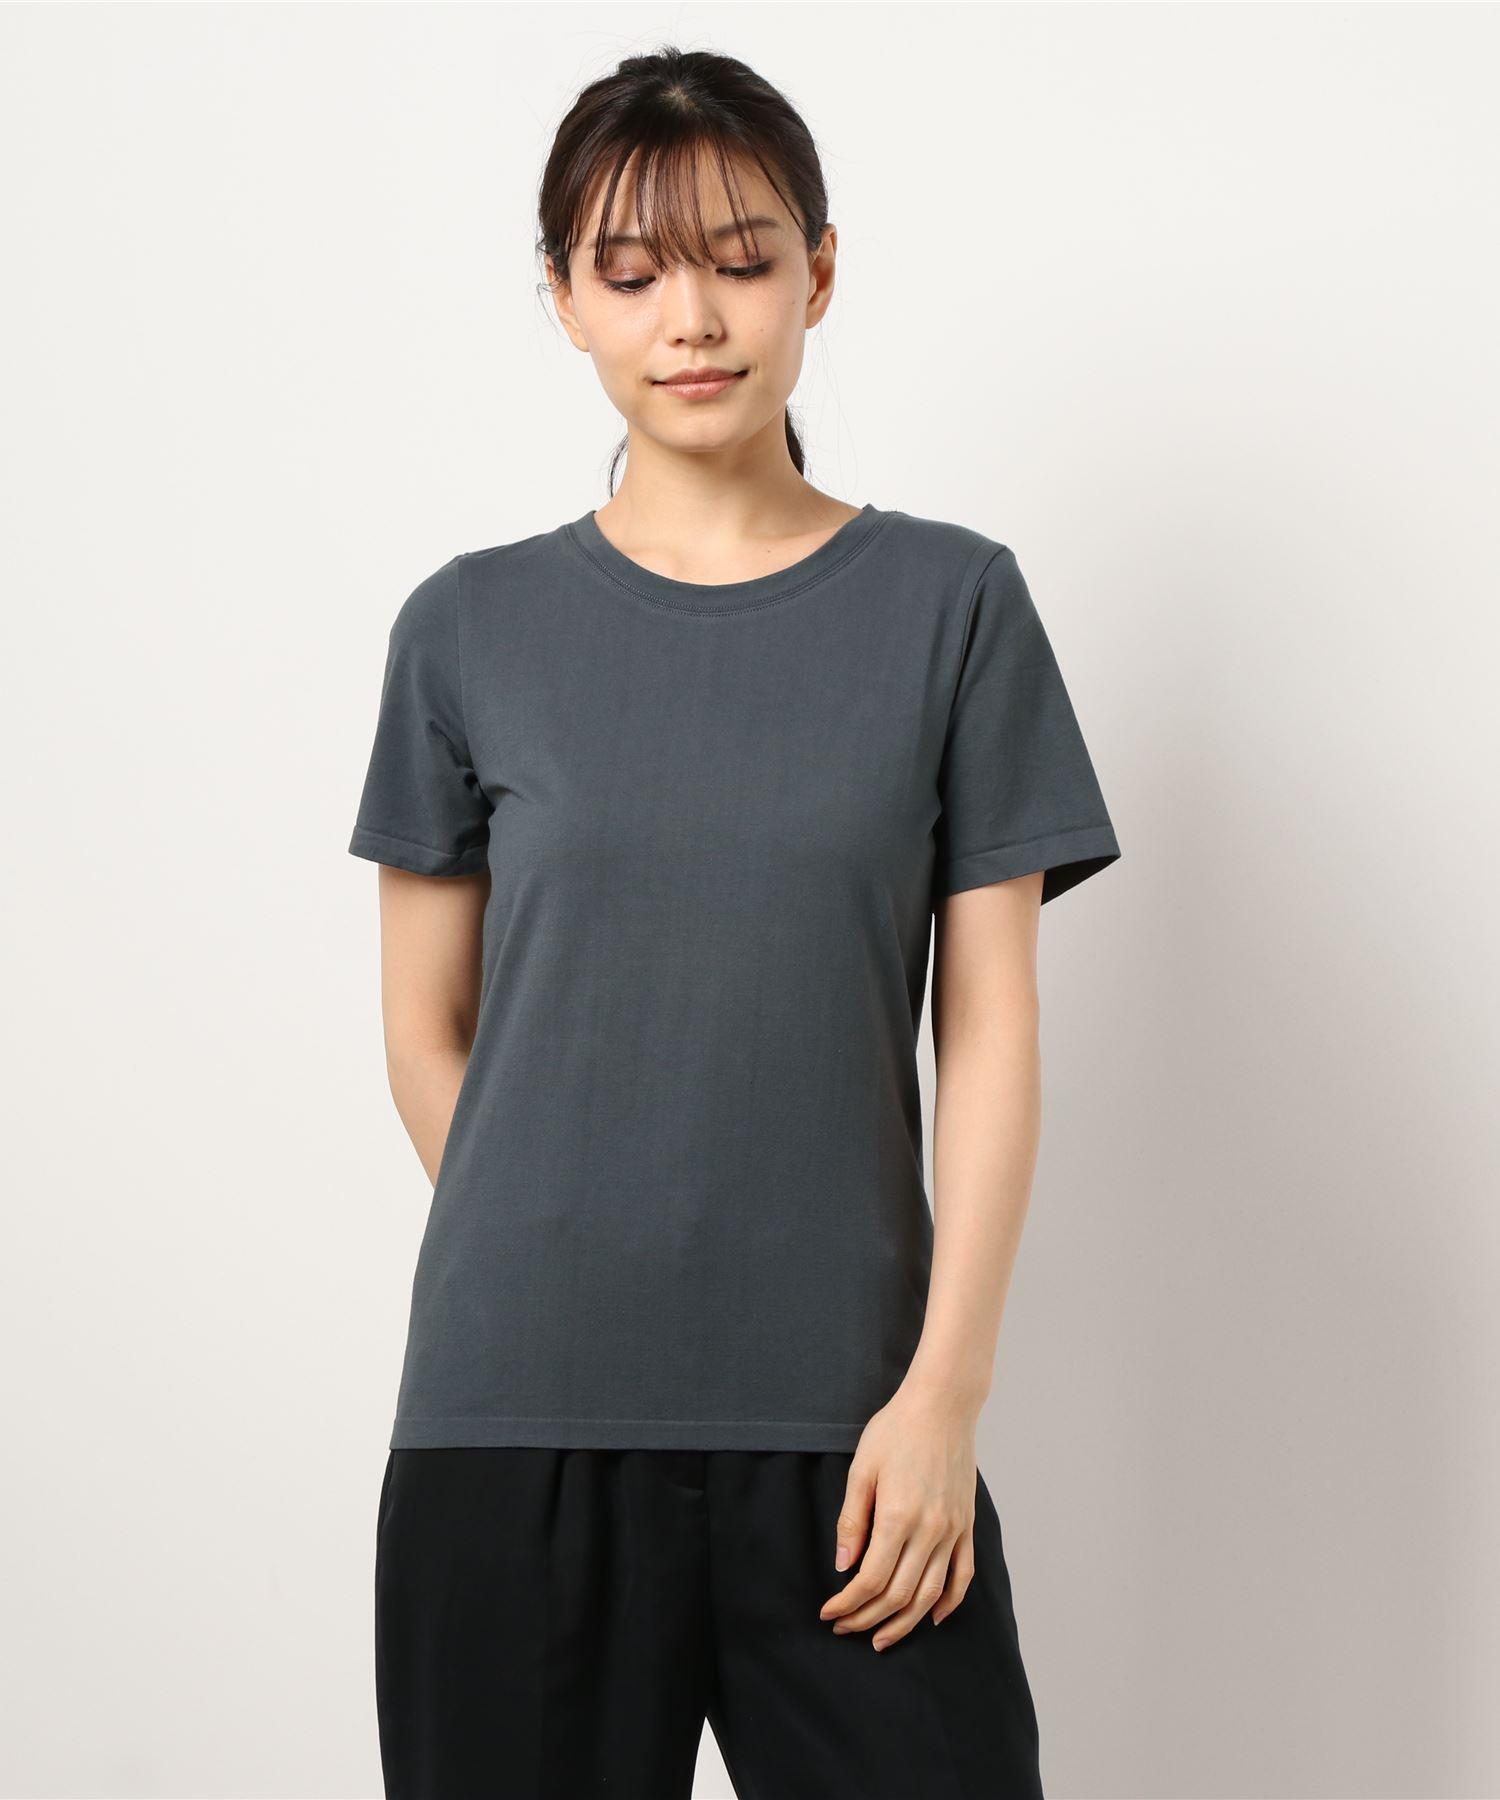 【THE CHIC】オーガニックコットンホールガーメントTシャツ